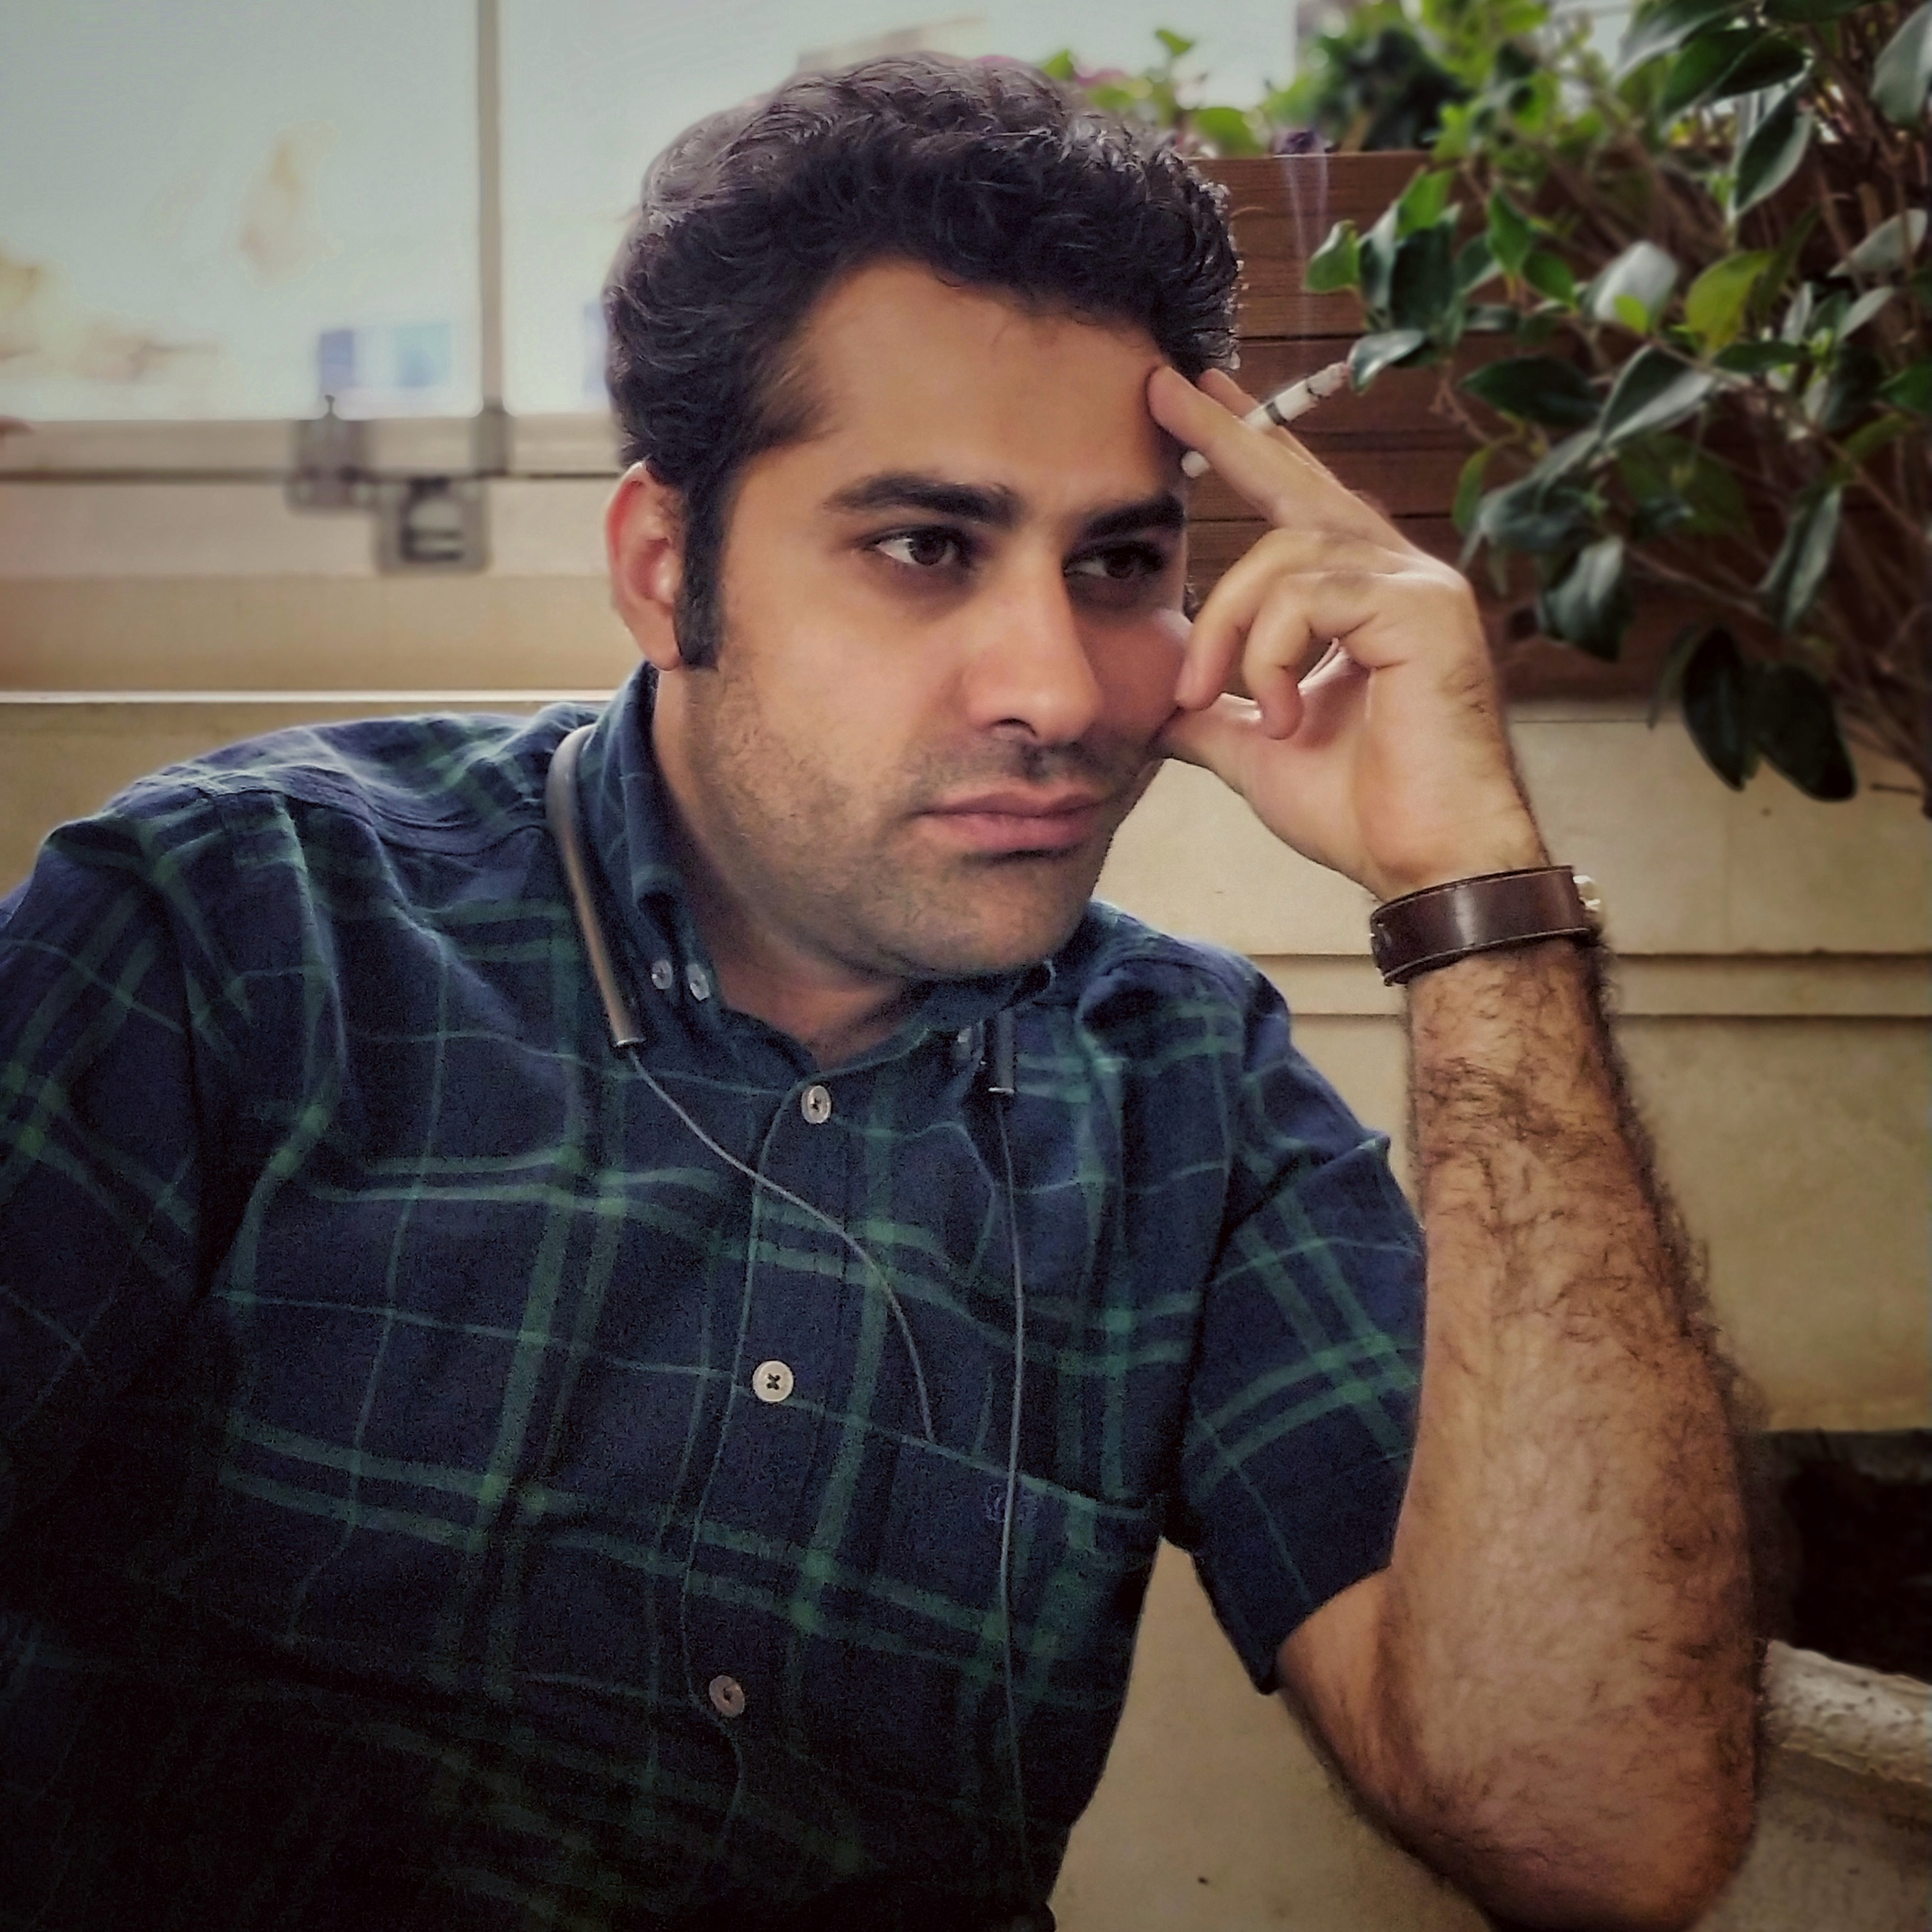 حسام الدین مطهری داستاننویس